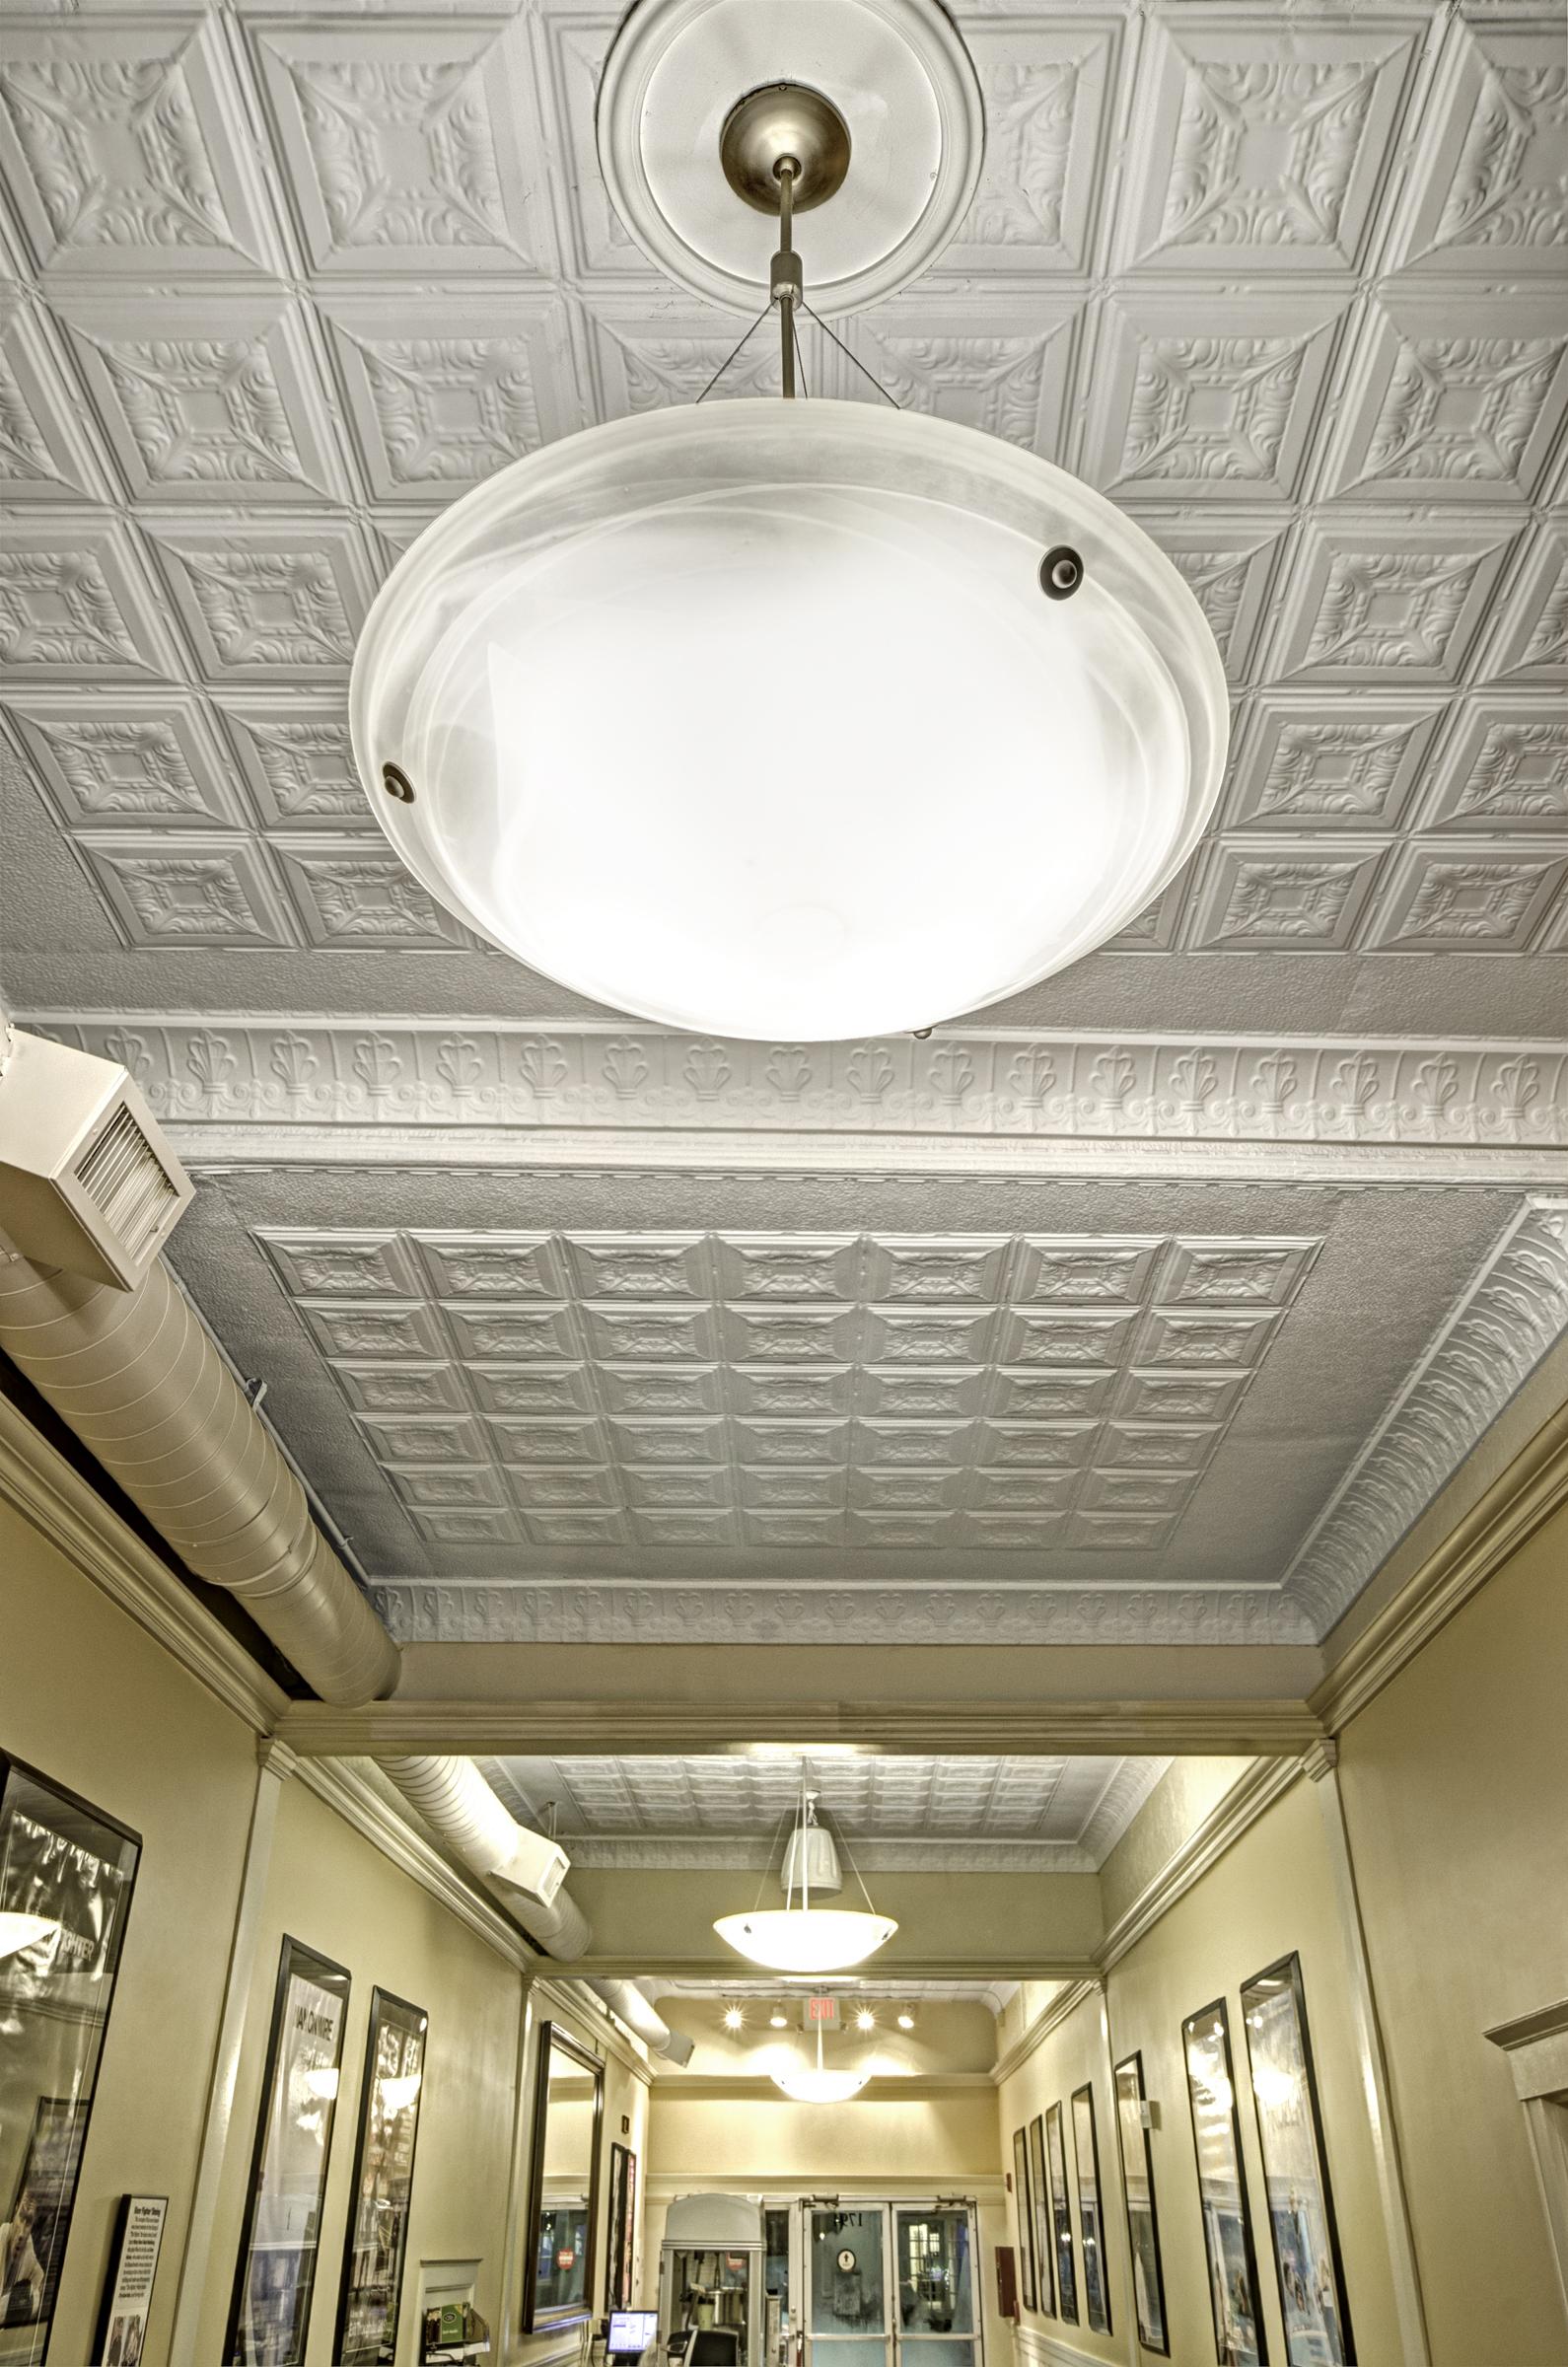 Ceiling_Lights_Lobby